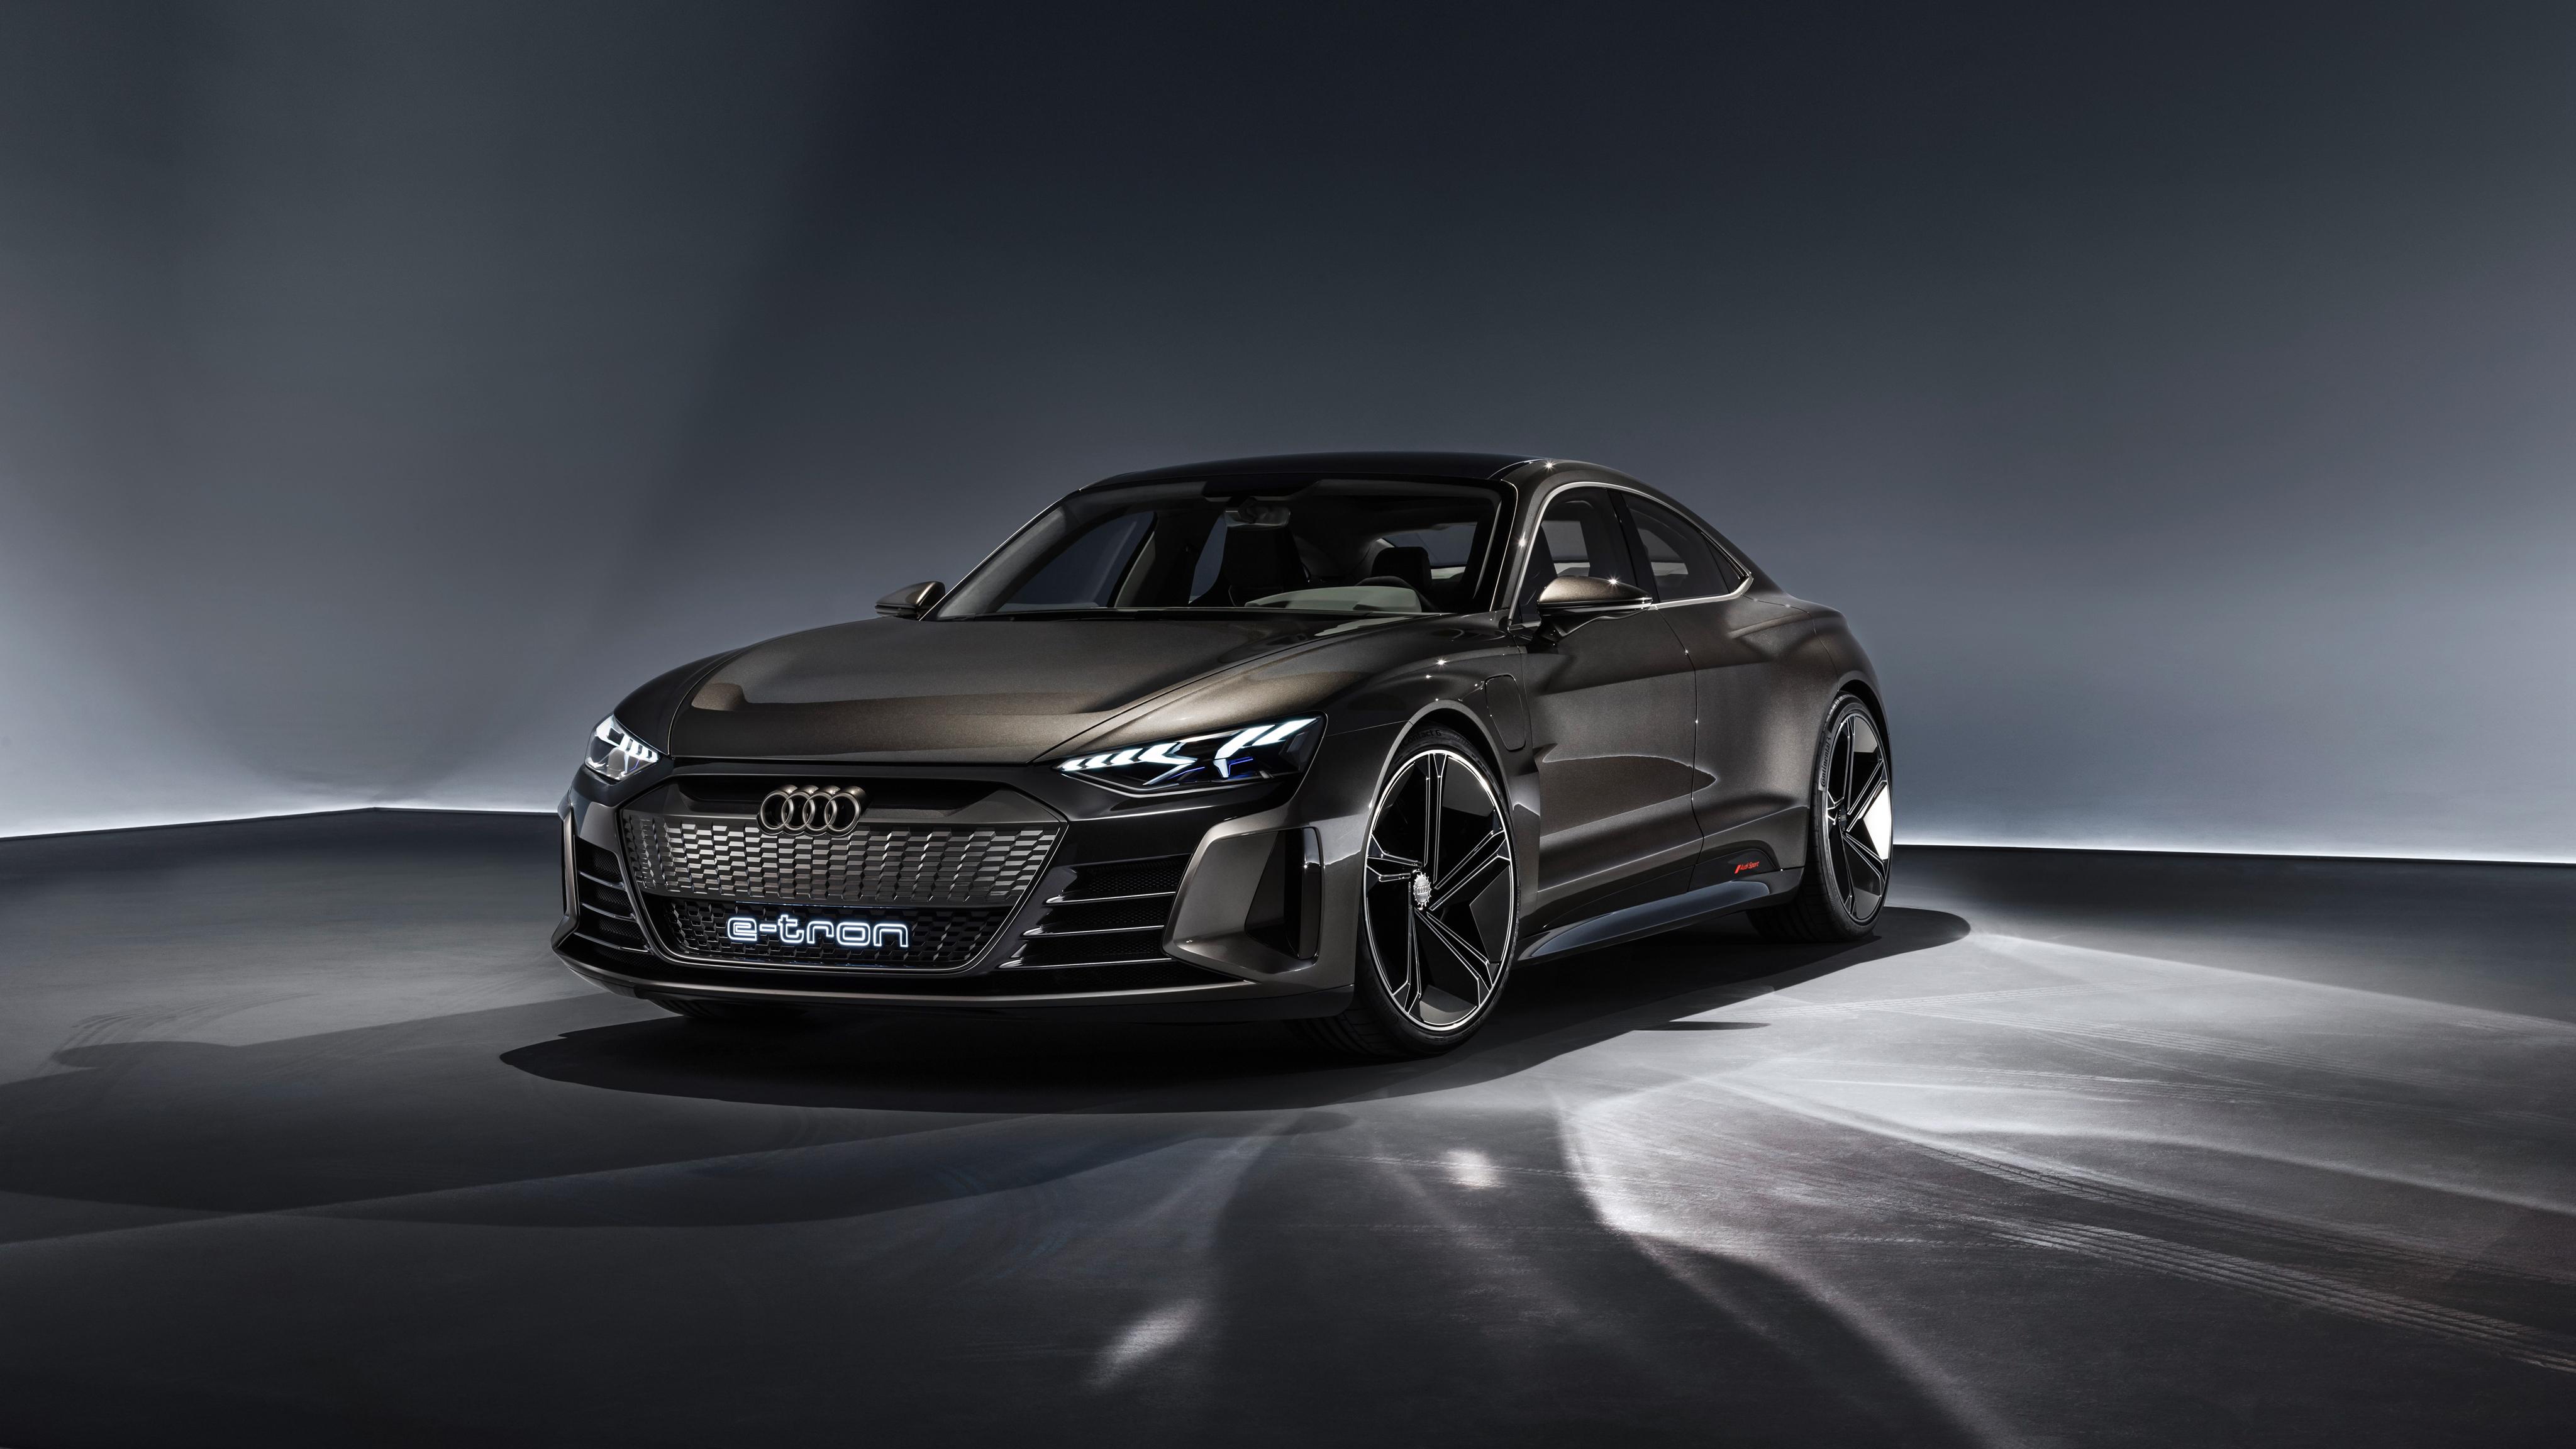 Audi e tron GT Concept 2019 4K Wallpapers HD Wallpapers 4096x2304